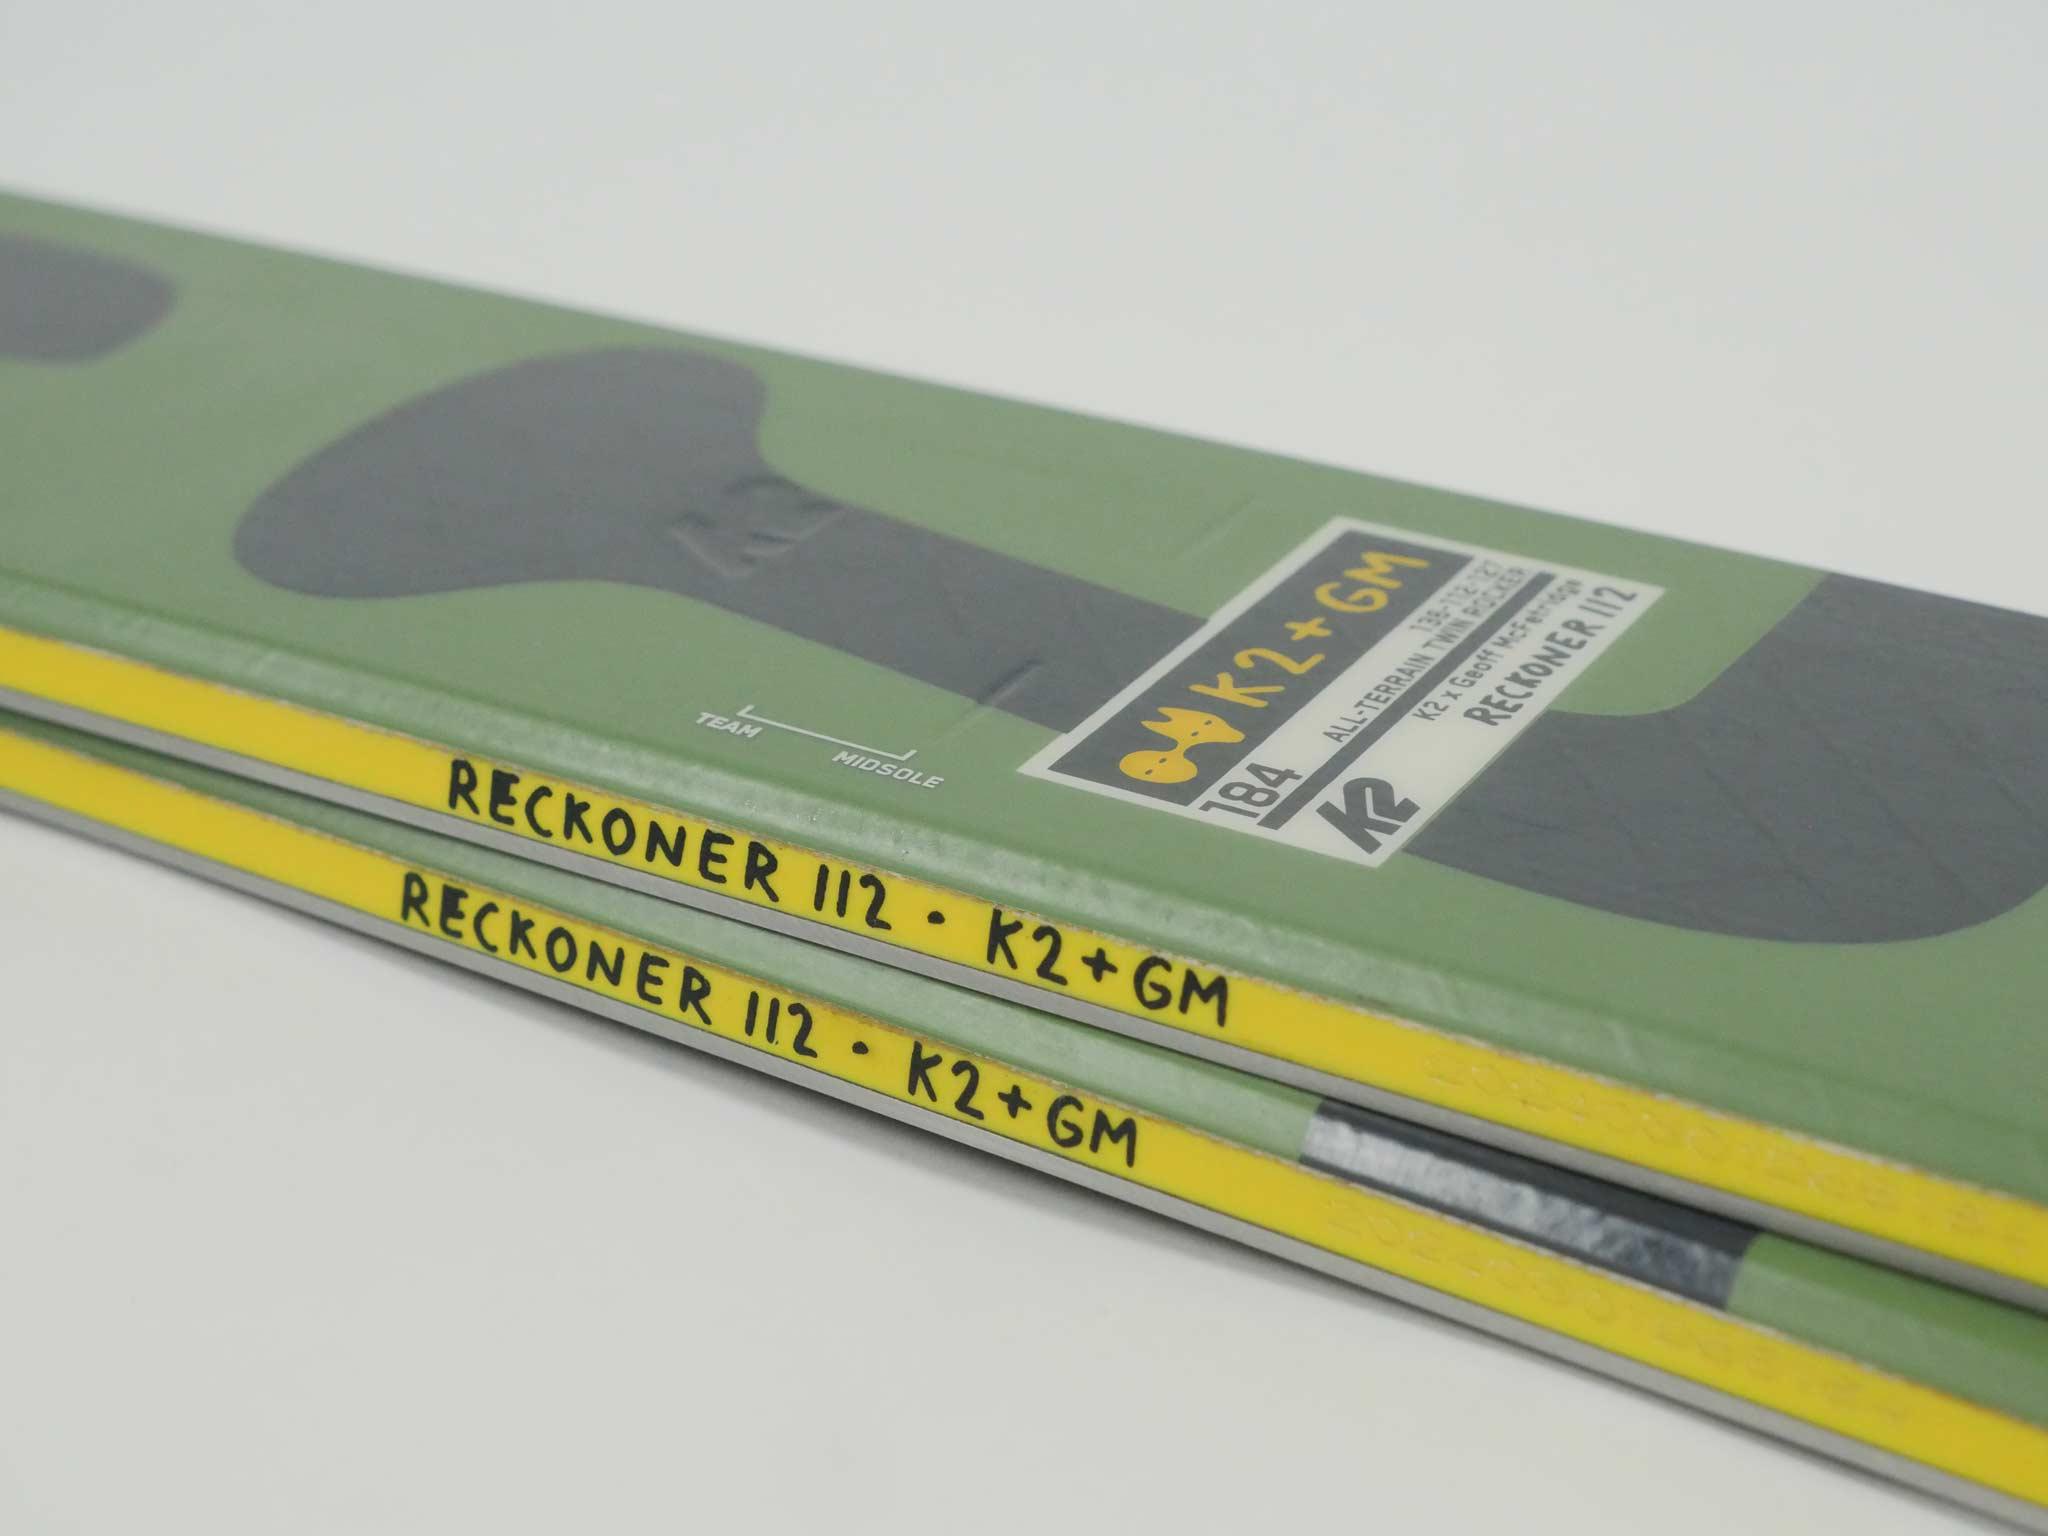 K2 x Geoff McFetridge: Reckoner 112